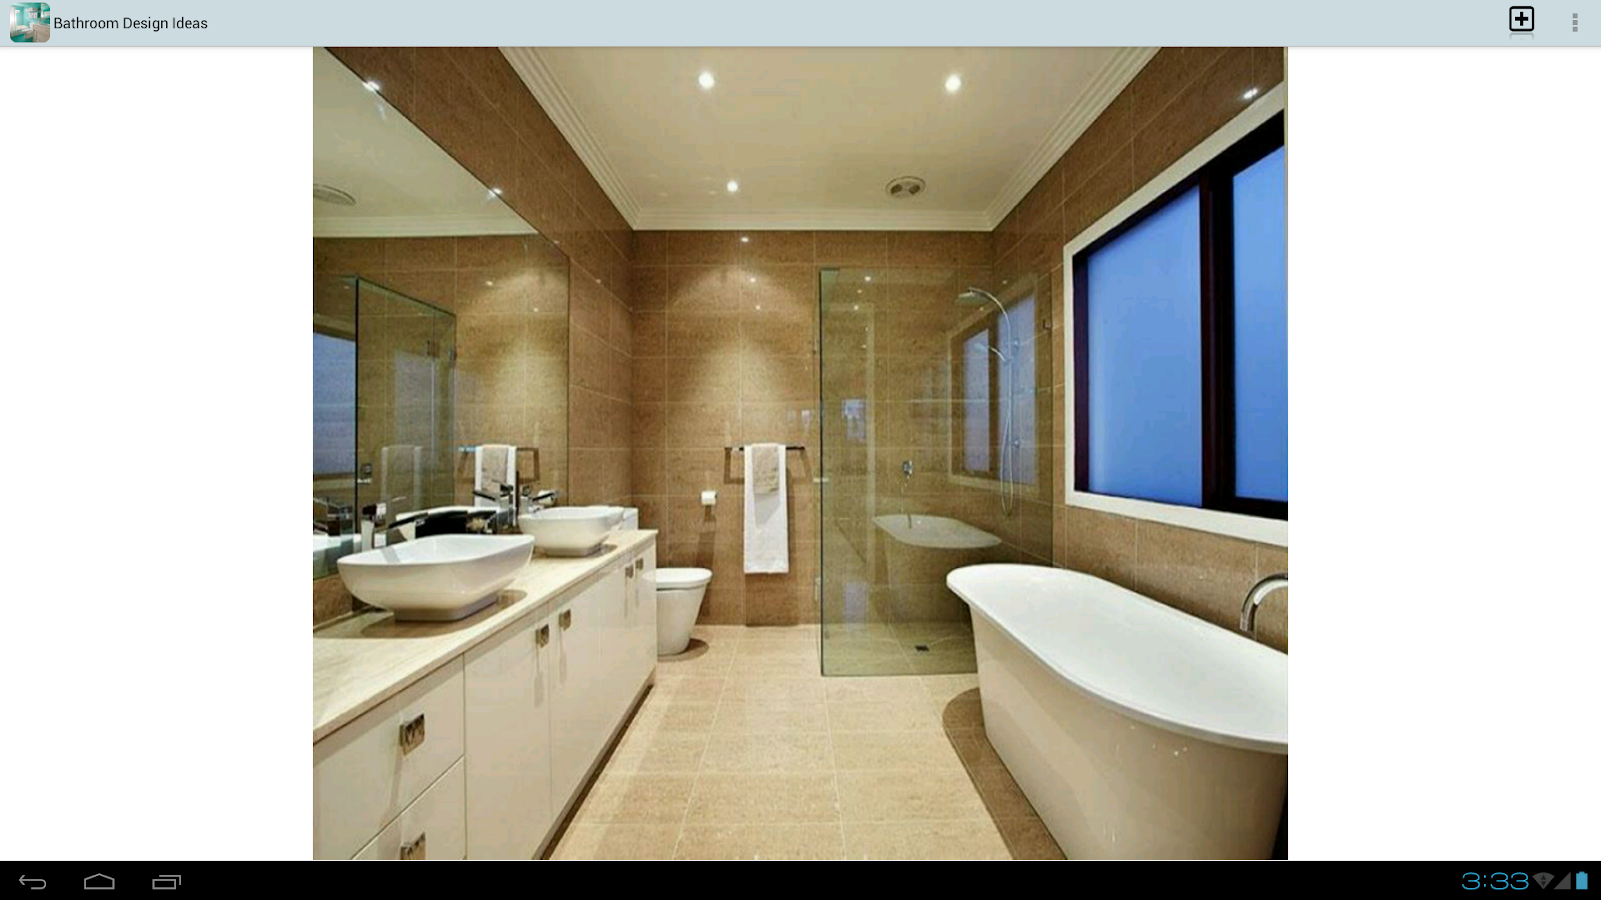 Bathroom design ideas android apps on google play for Bathroom layout app